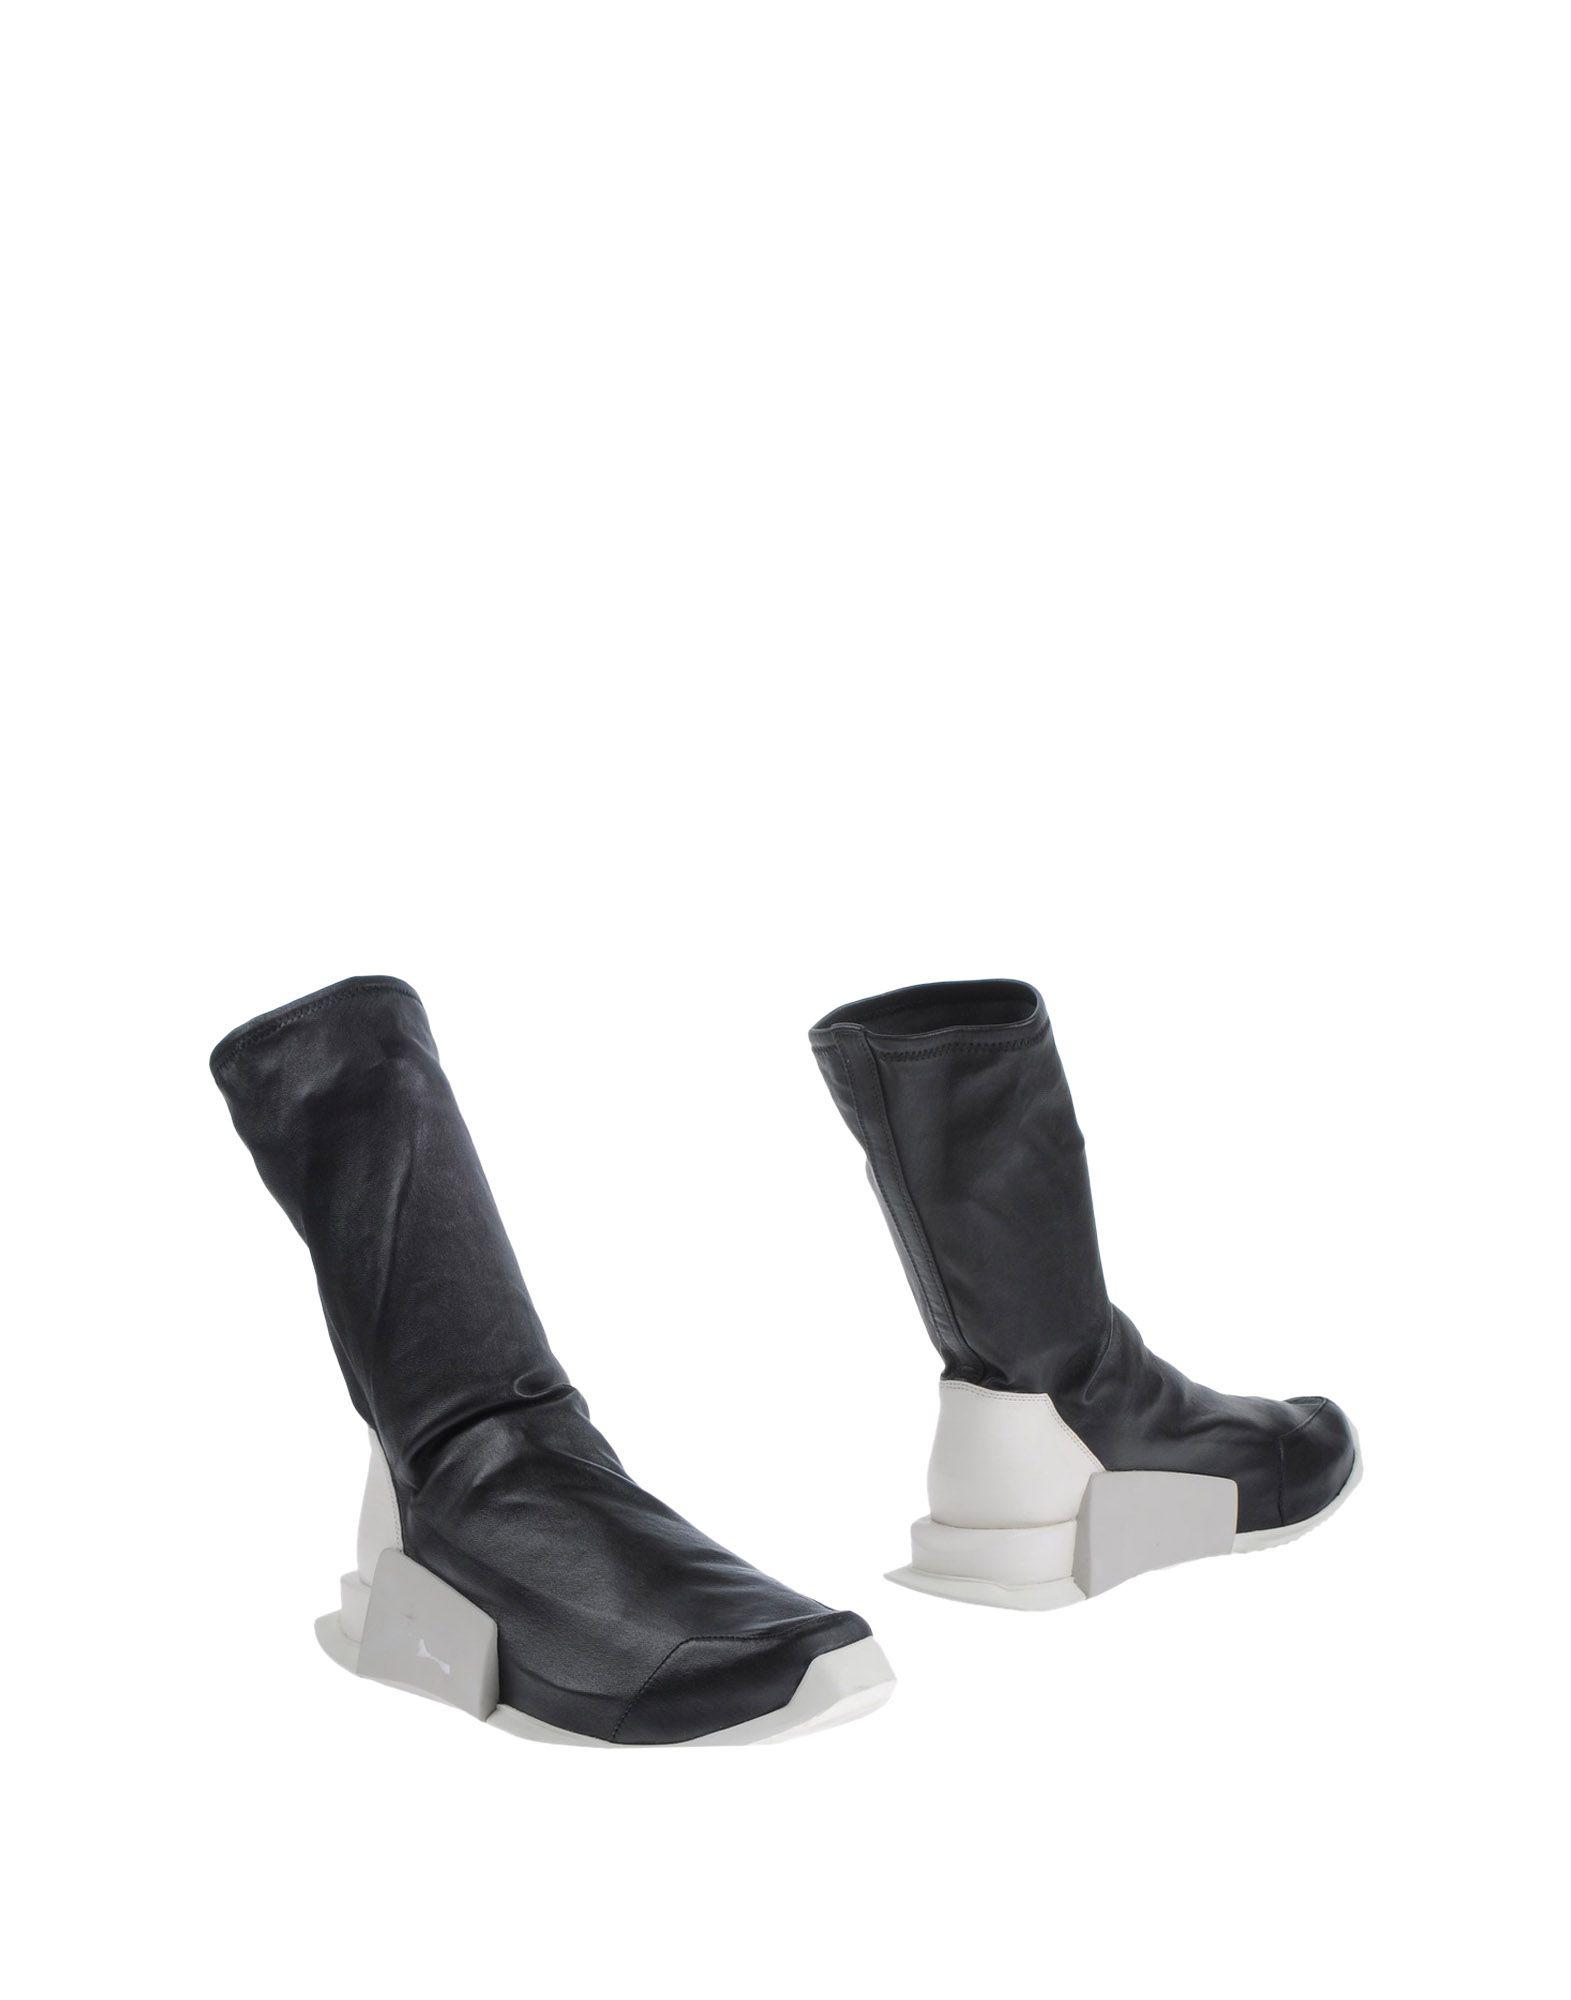 Sneakers Rick Owens X Adidas Homme - Sneakers Rick Owens X Adidas sur